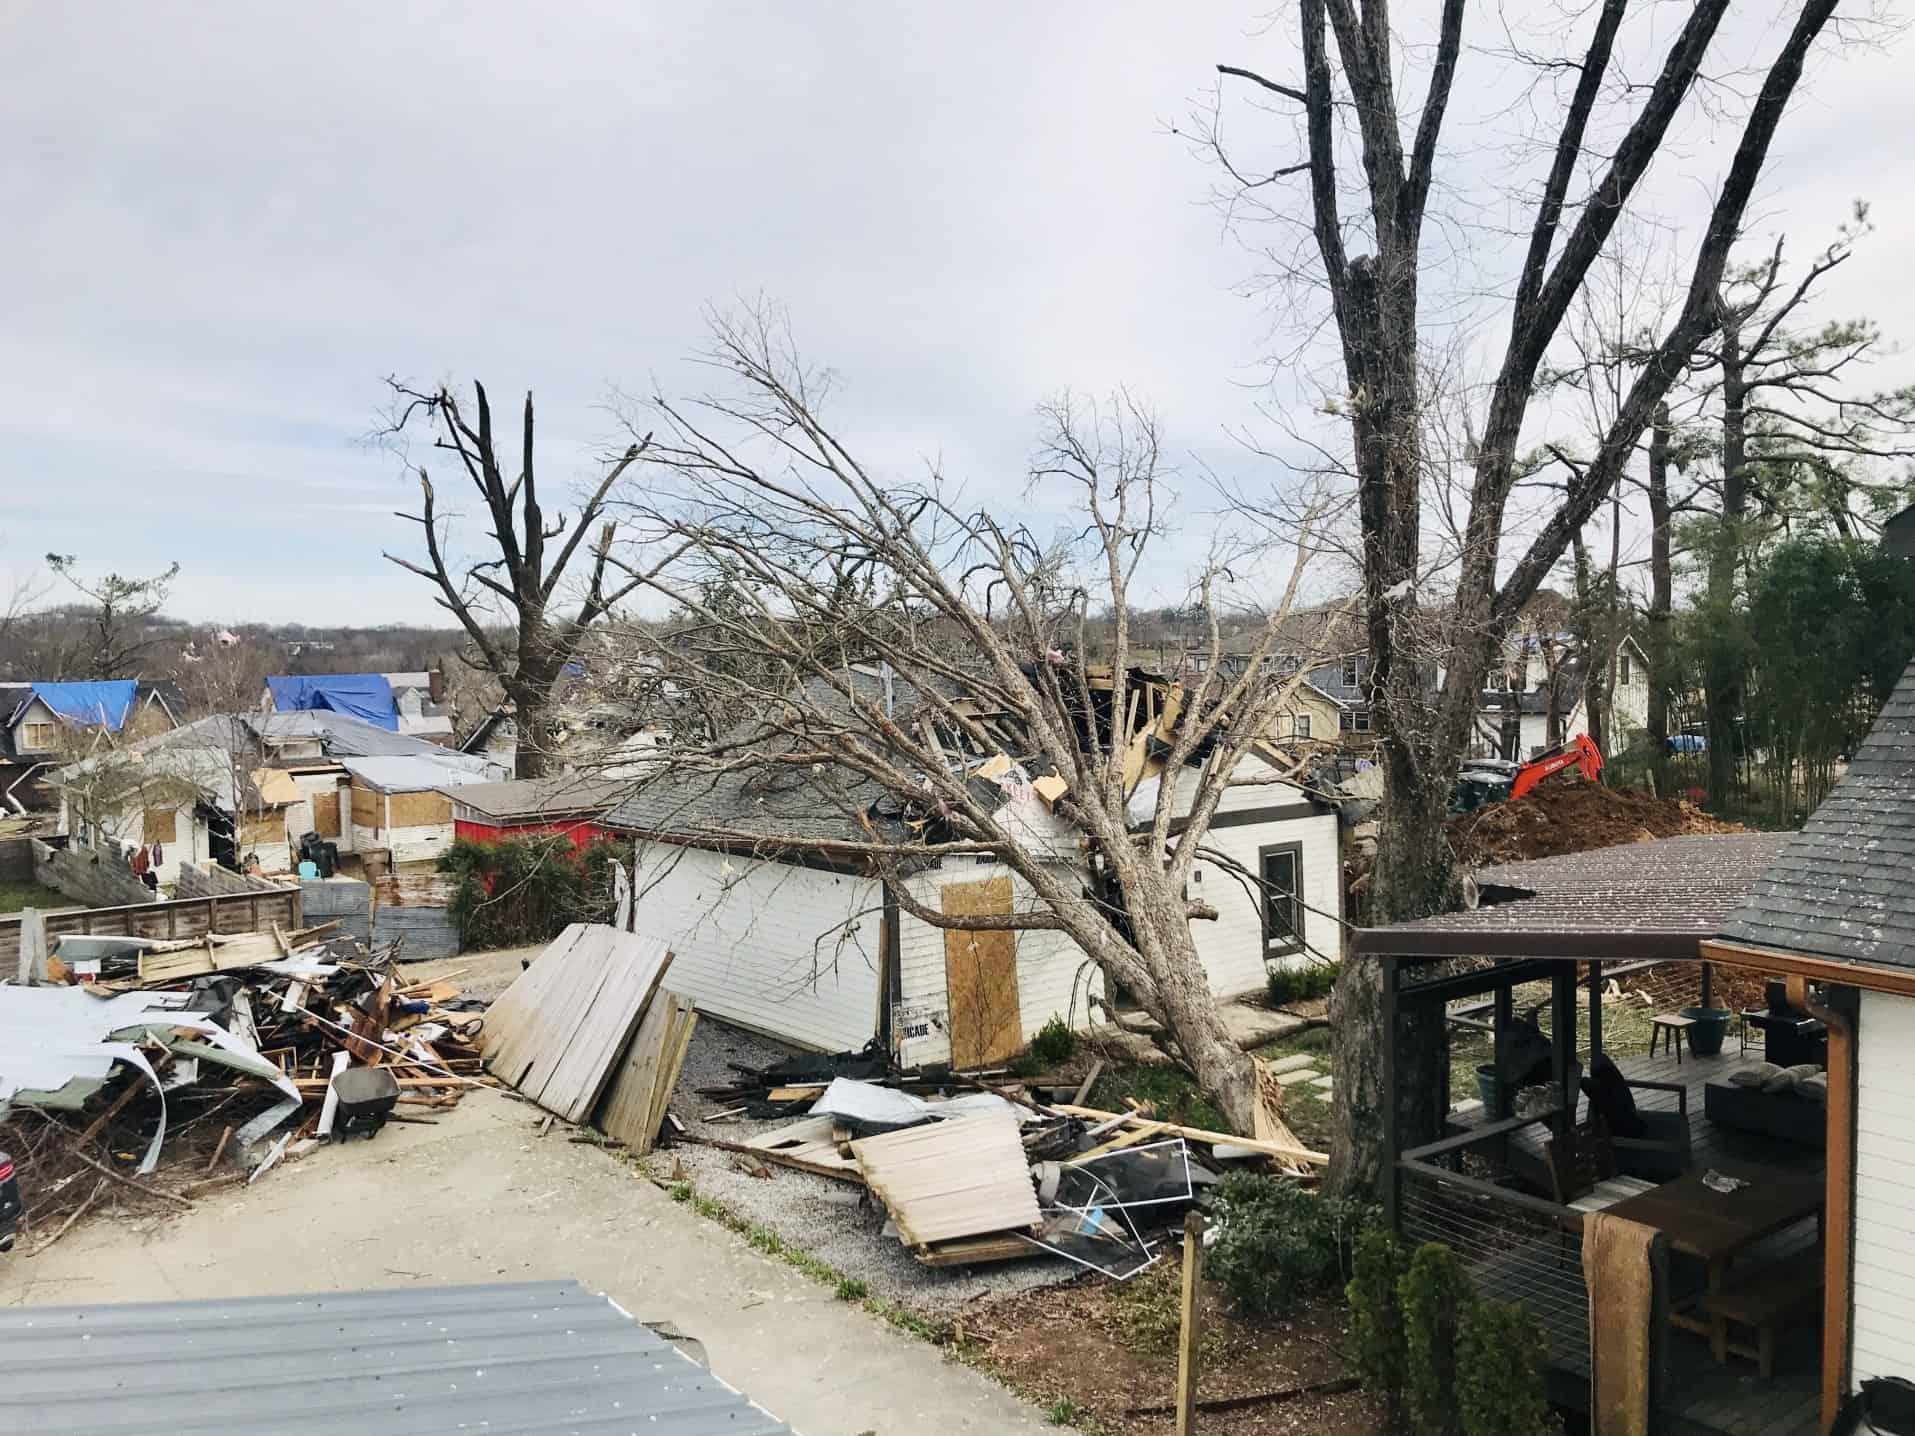 A tornado damaged neighborhood in Nashville Tennessee